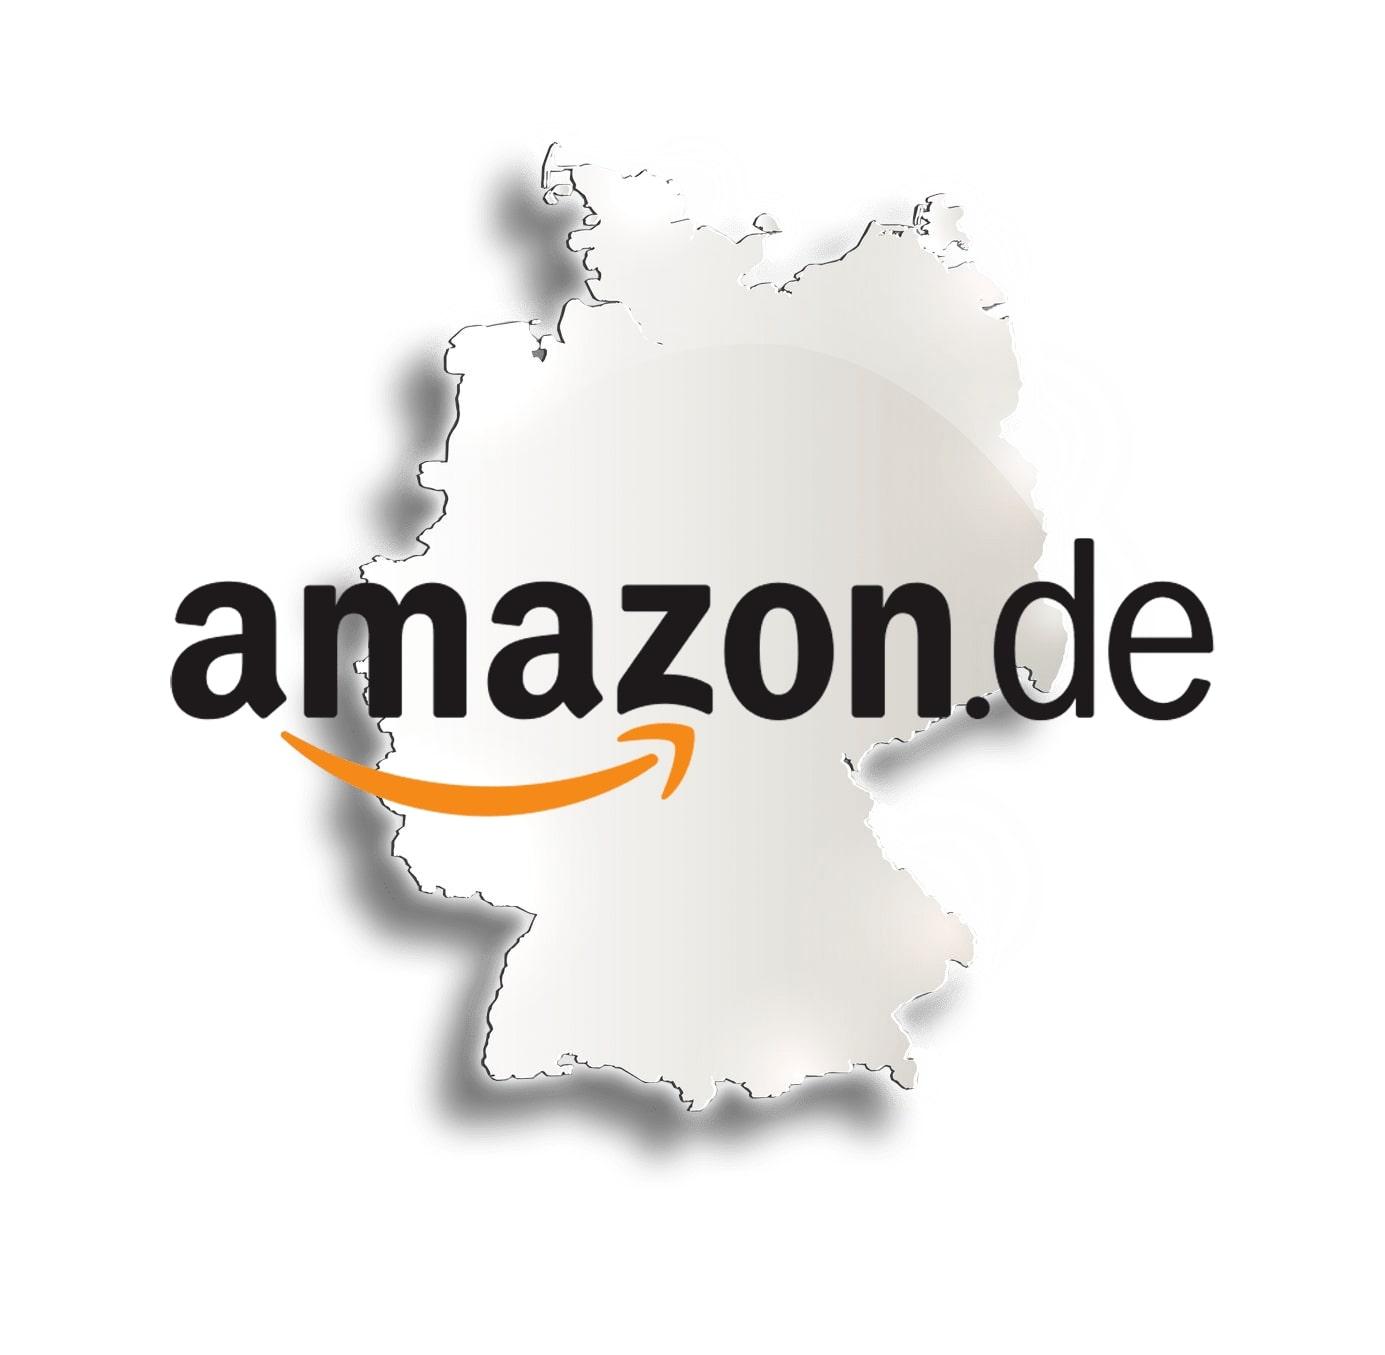 amazon.de-freigestellt-min